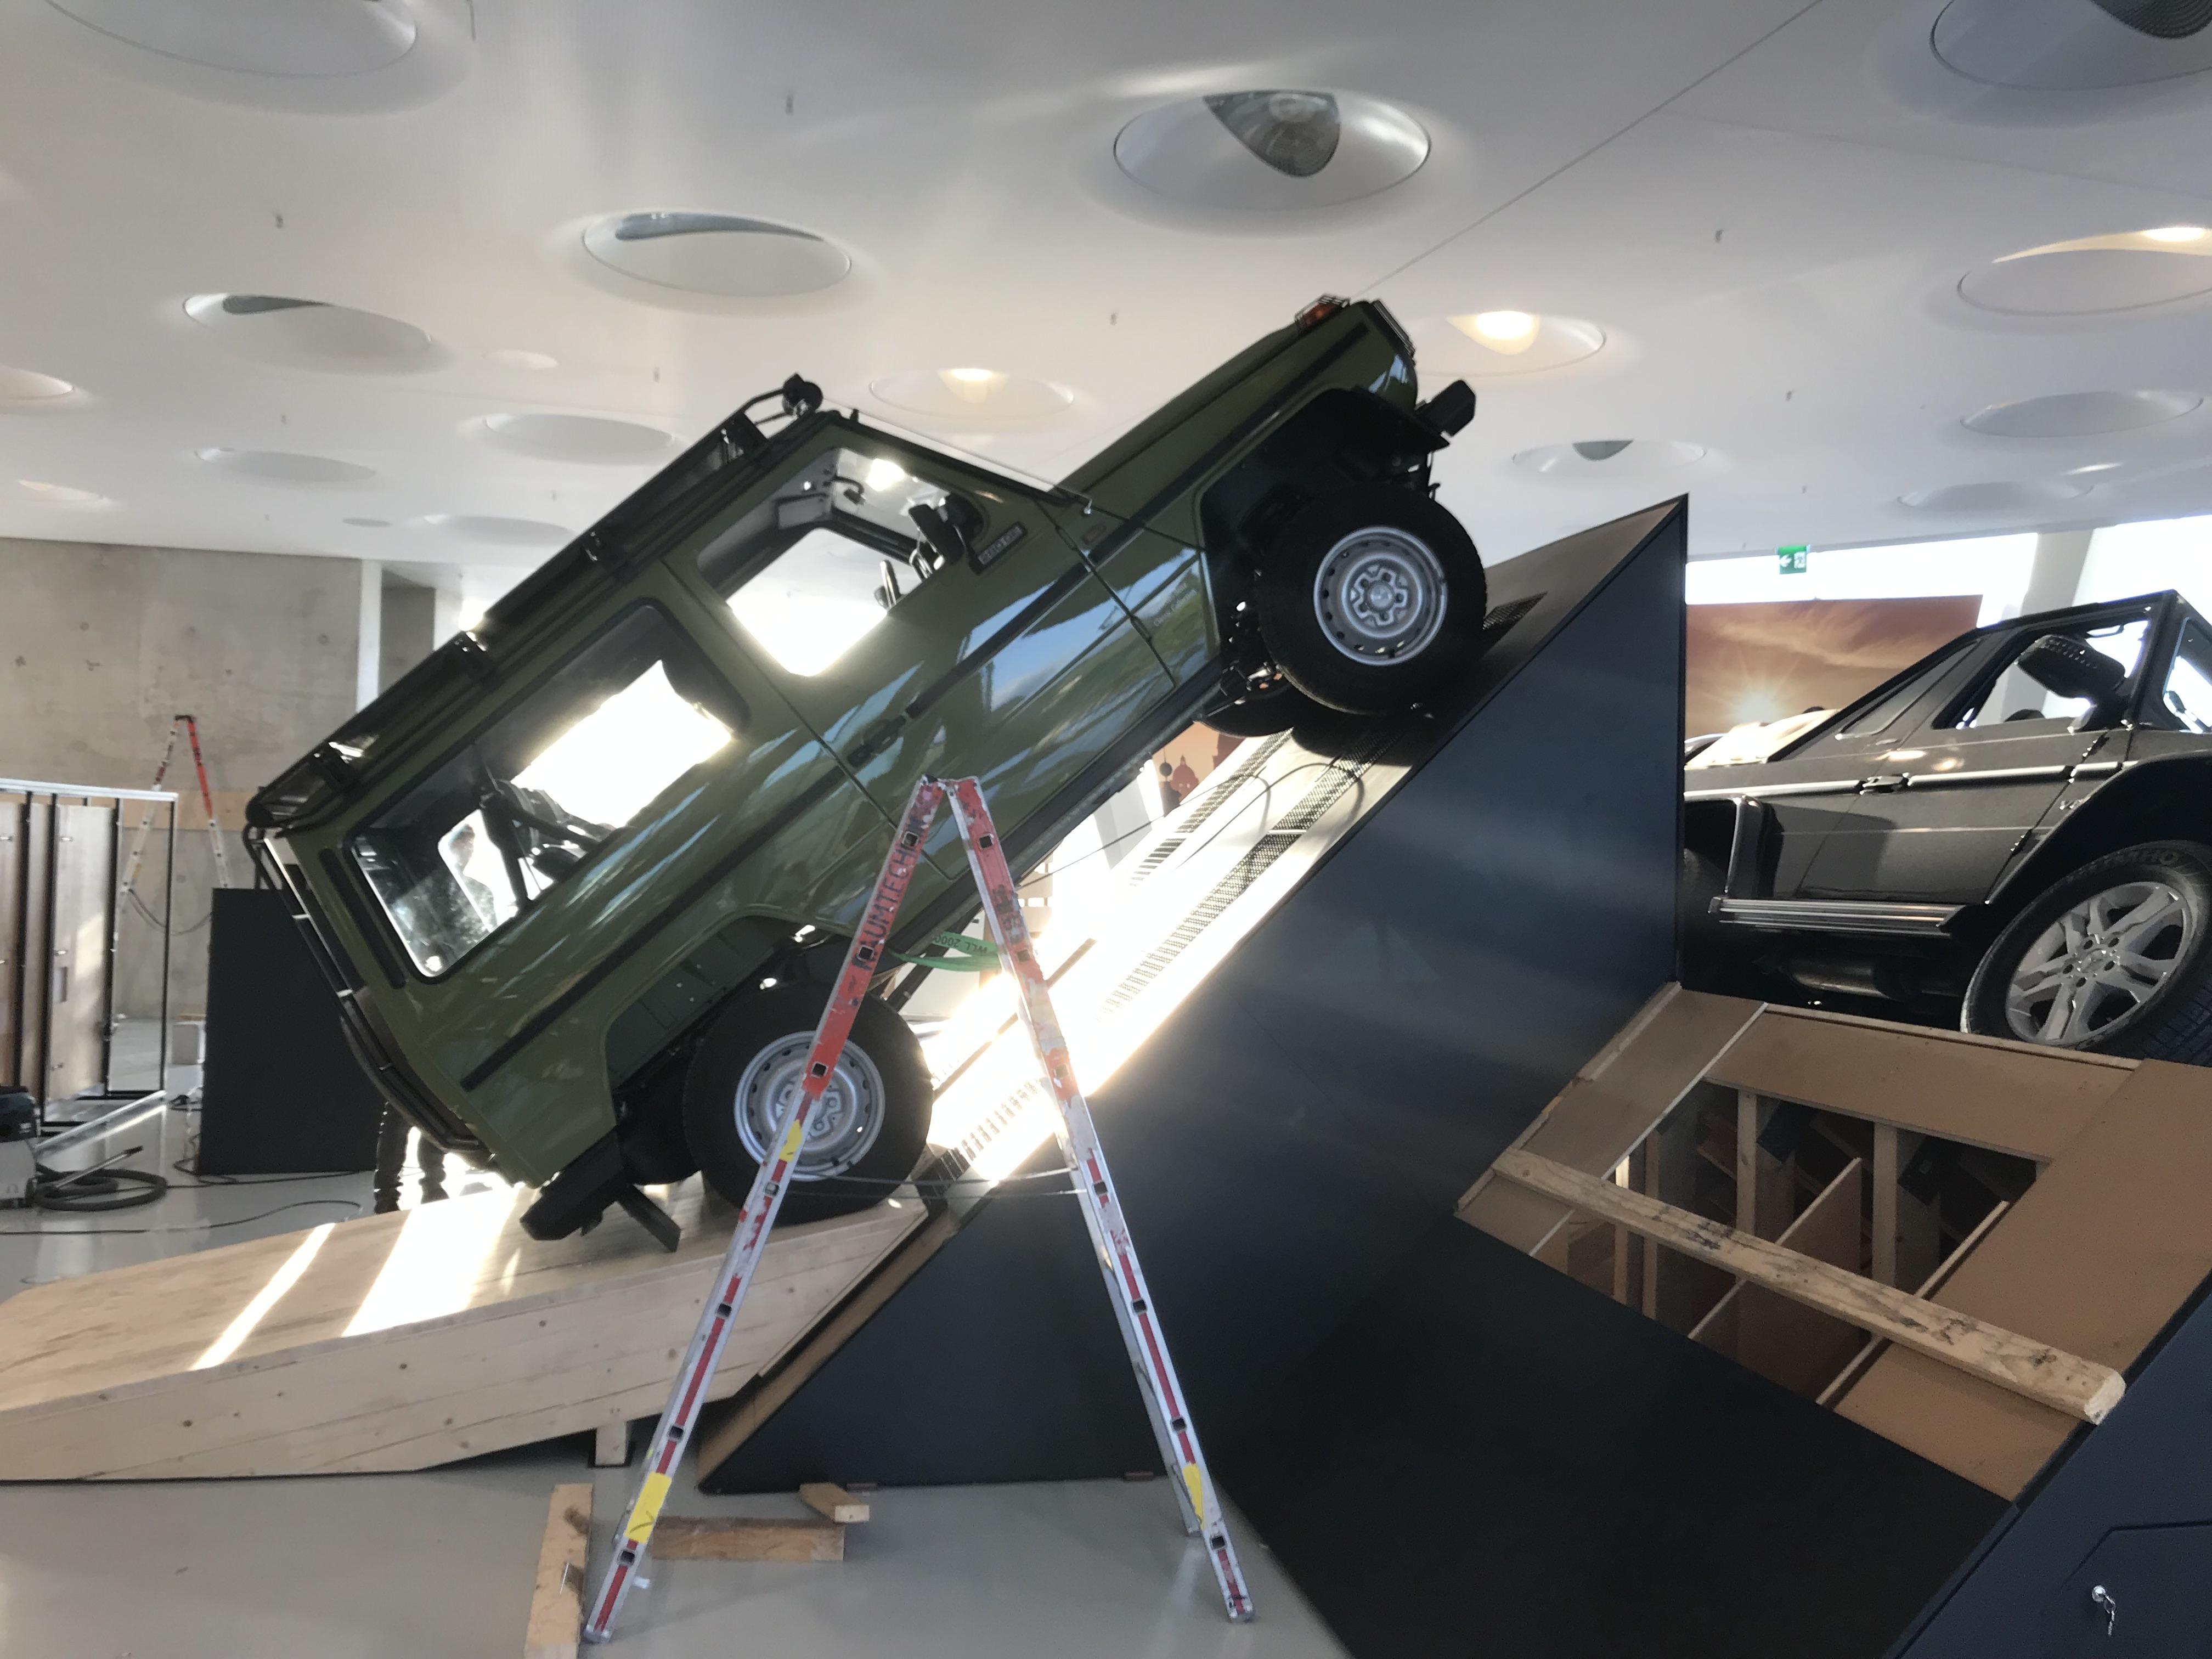 """G-Schichten"" (G stories): dal 18 ottobre si terrà la mostra dedicata al Mercedes Classe G"